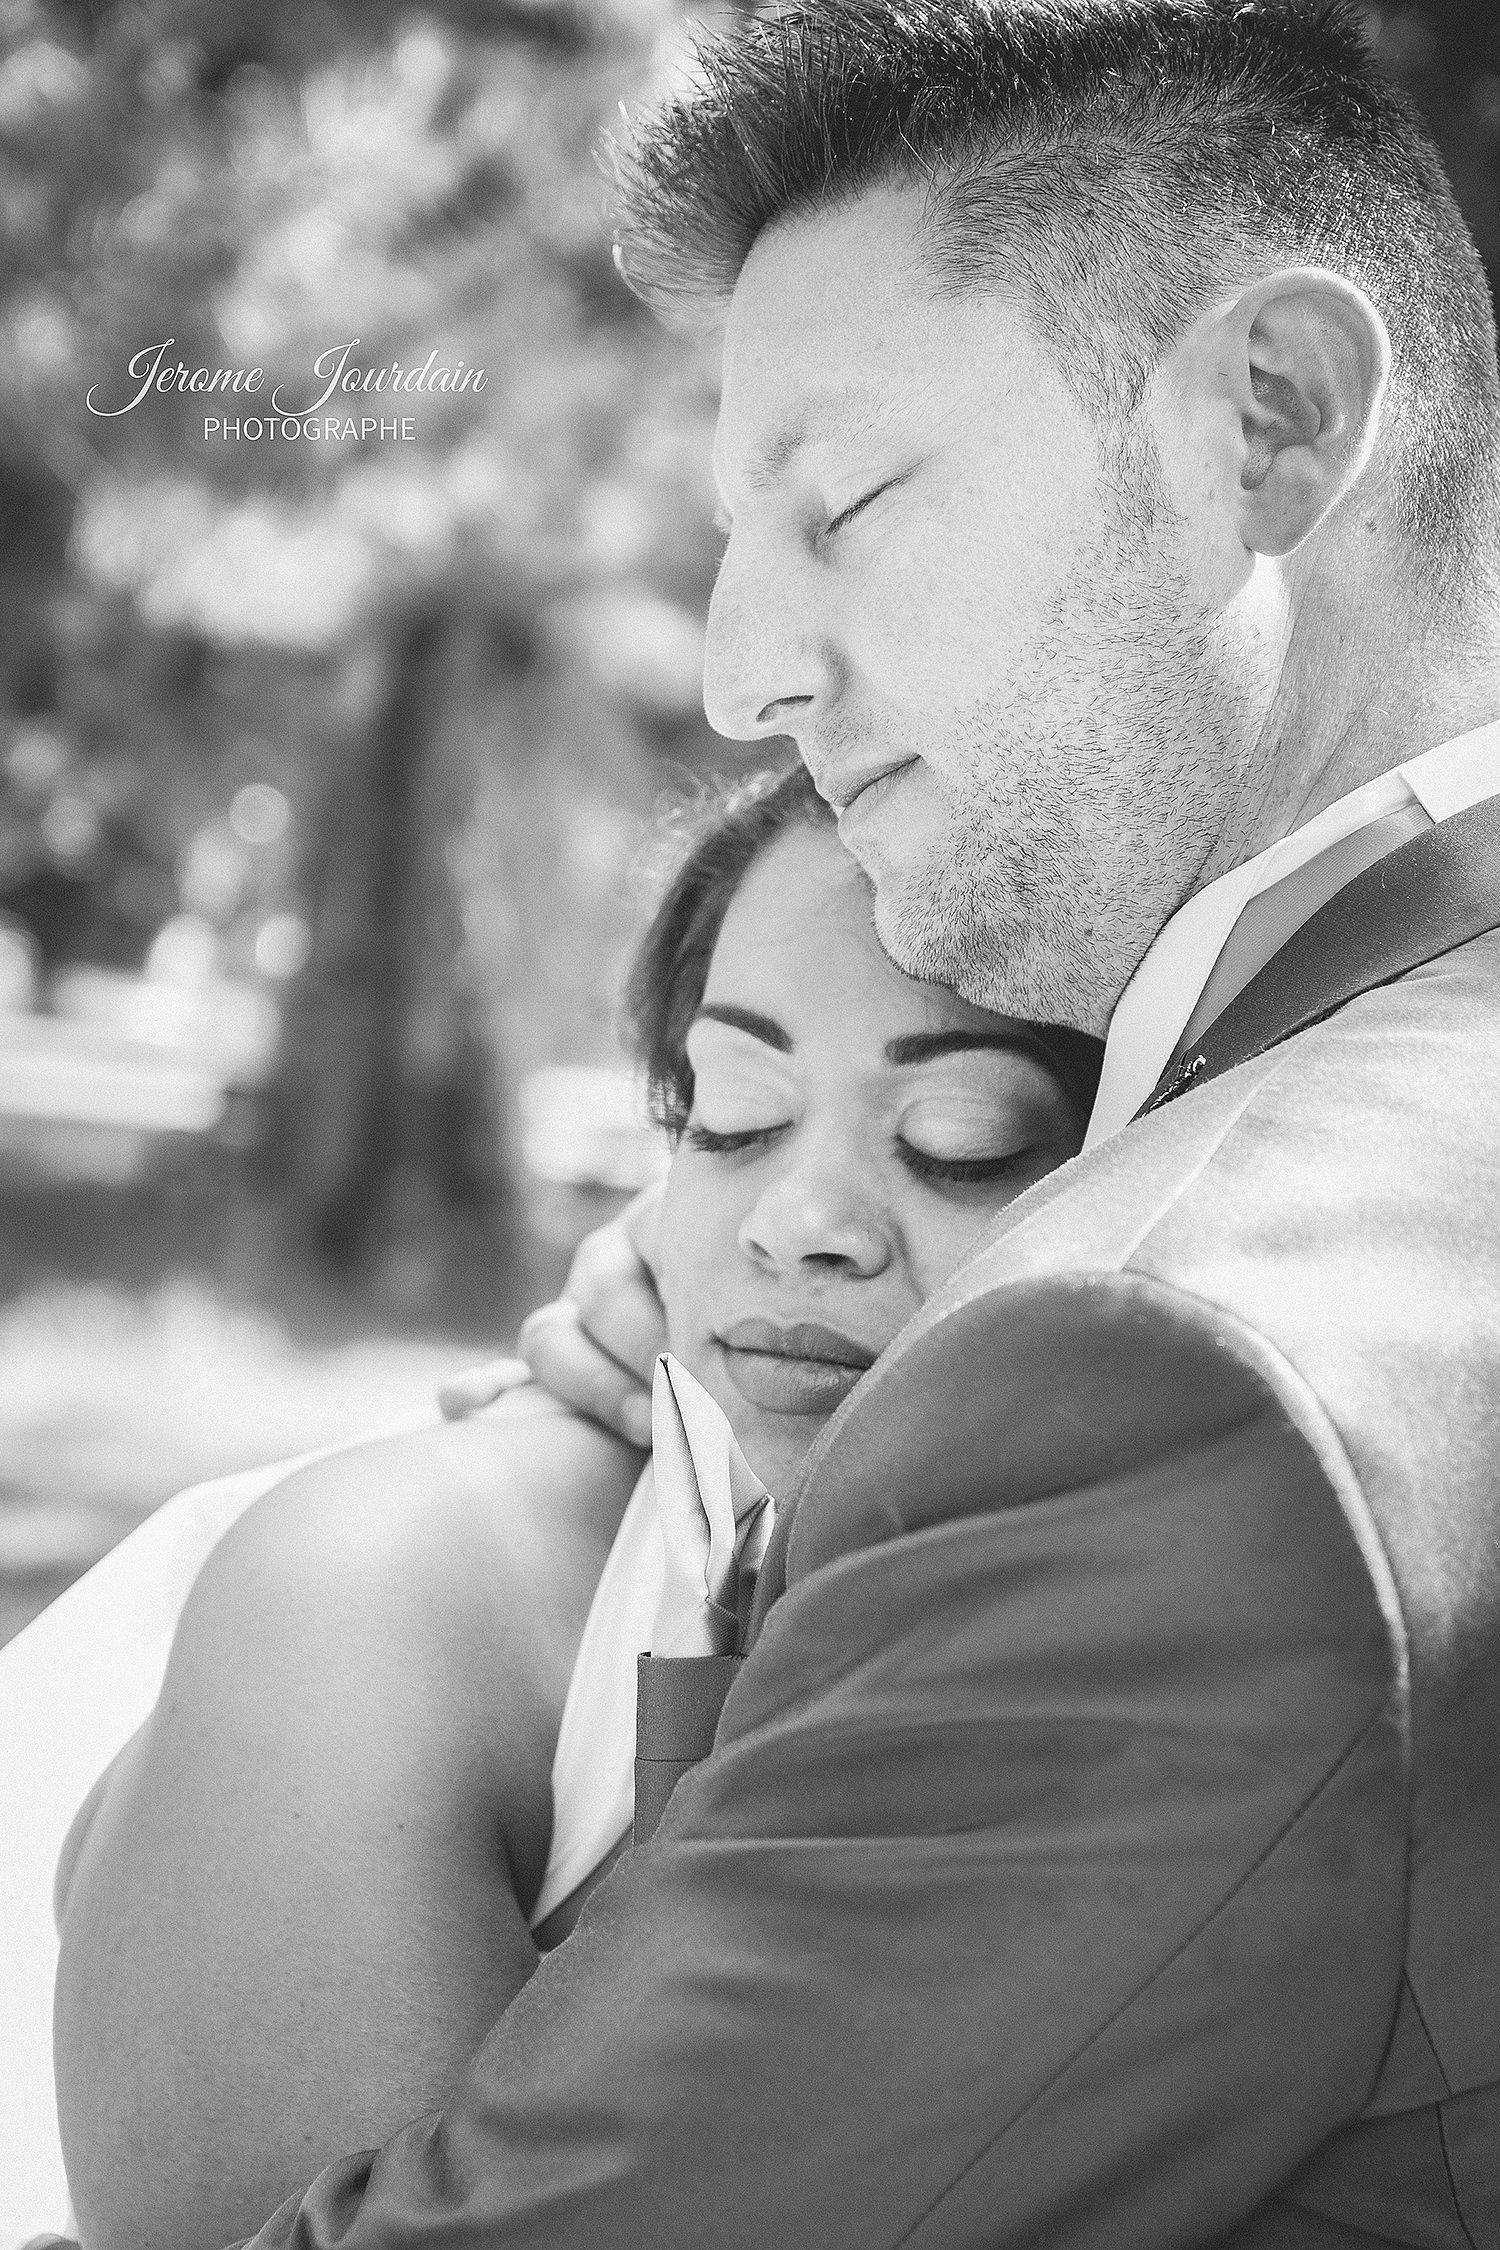 jerome jourdain photographe dordogne gironde jerome jourdain photographe mariage dordogne gironde 11 - Photographe Mariage Dordogne